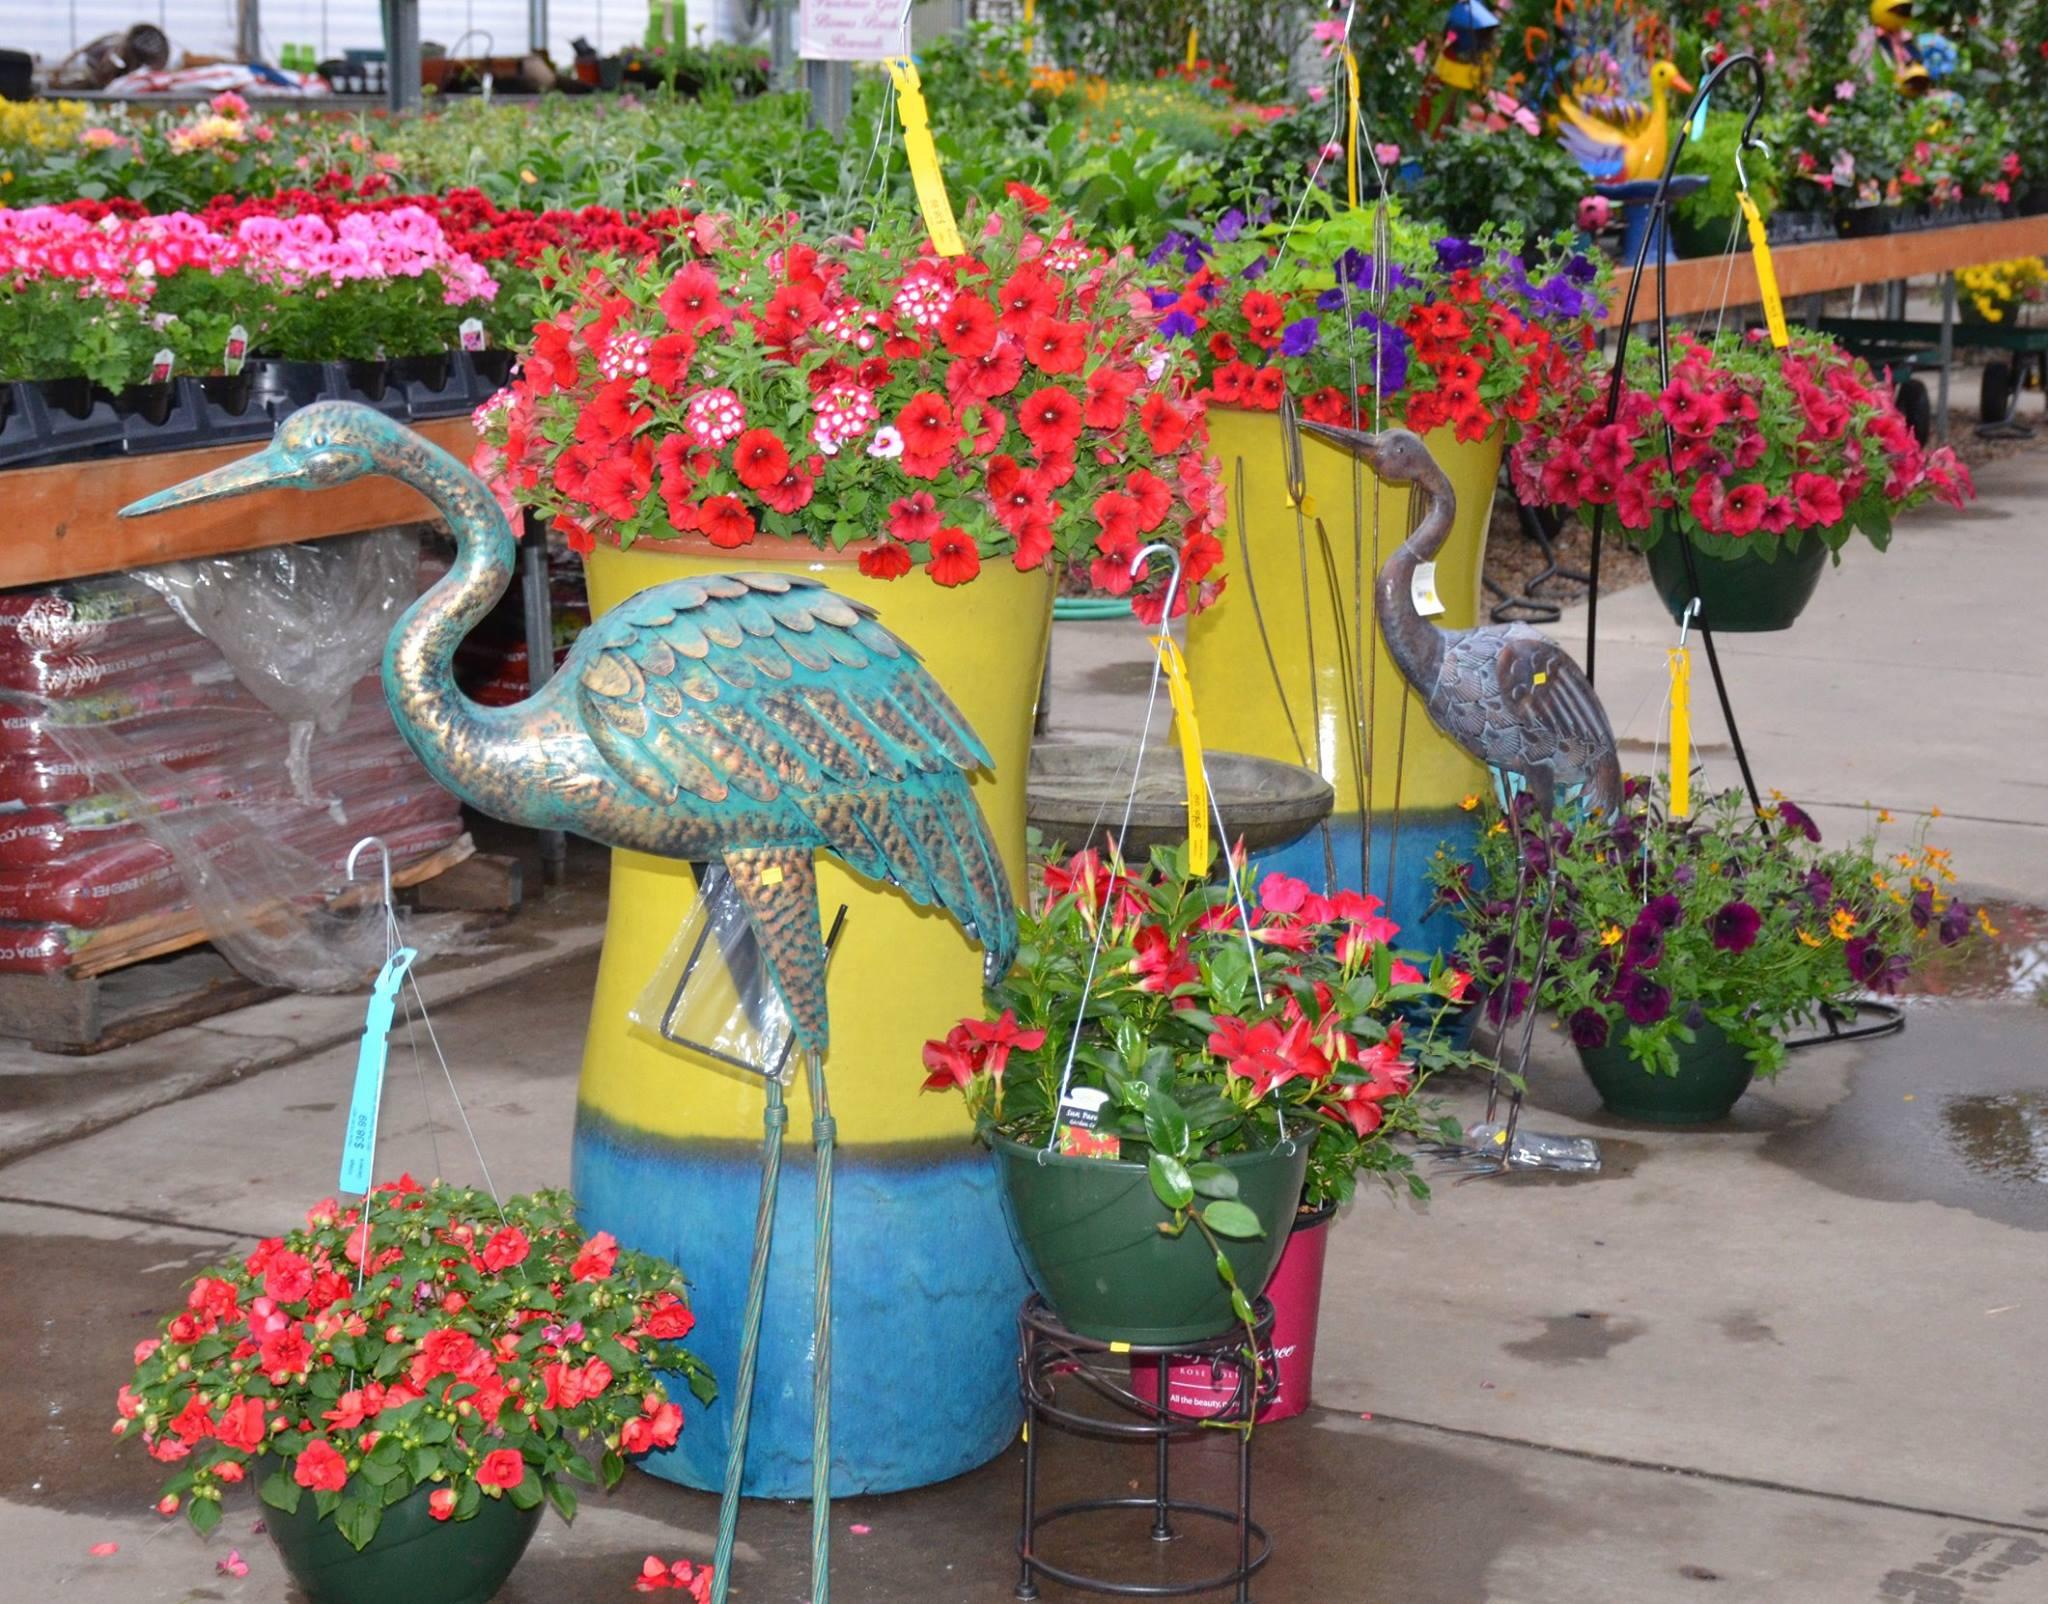 Greenhouse Baskets and Garden Art